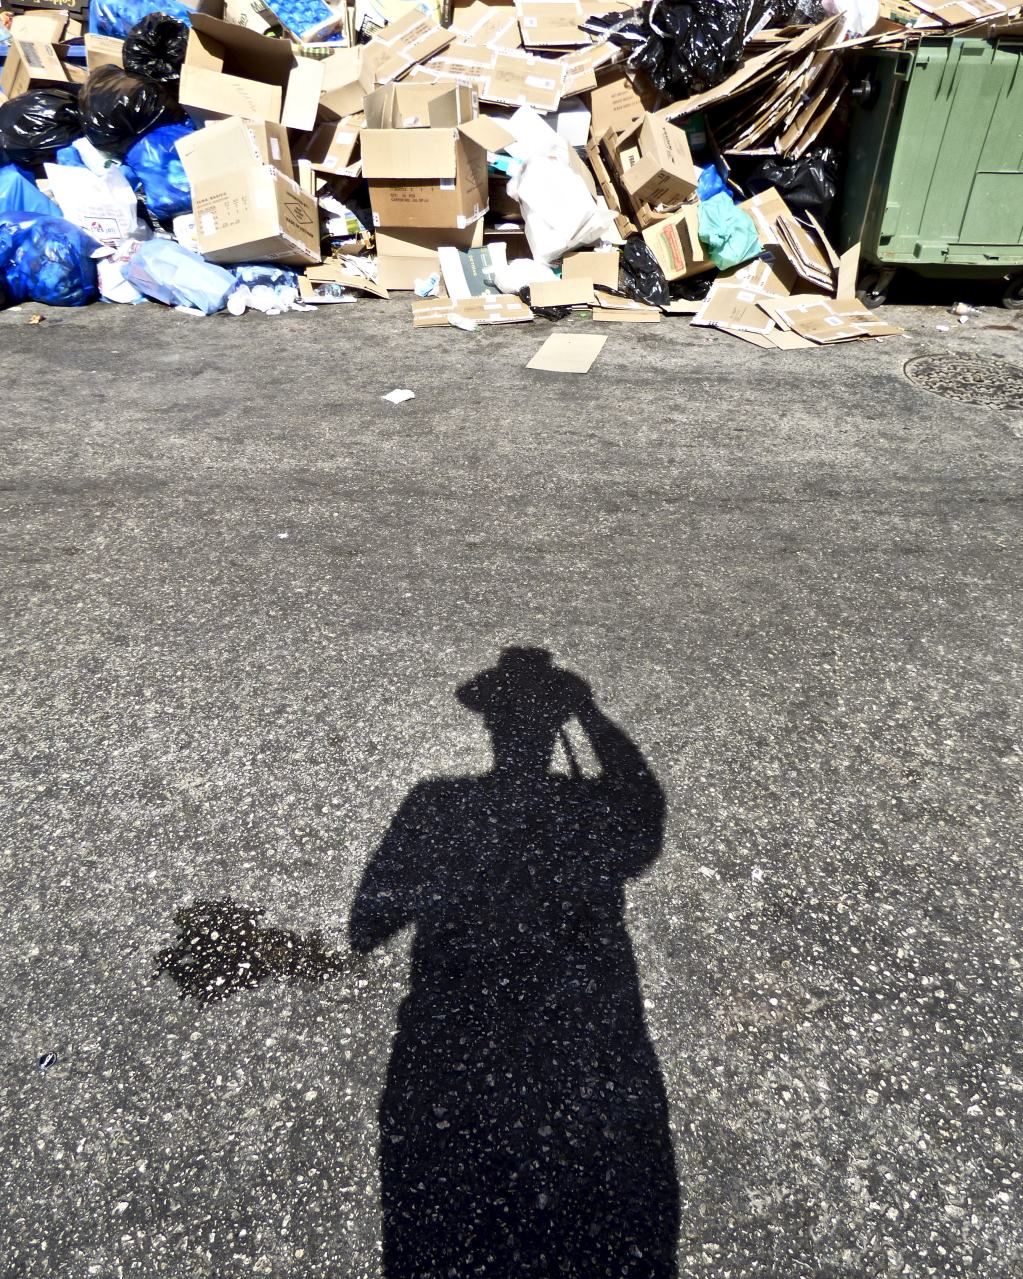 Self Portrait, Rubbish, Corfu Old Town 2018